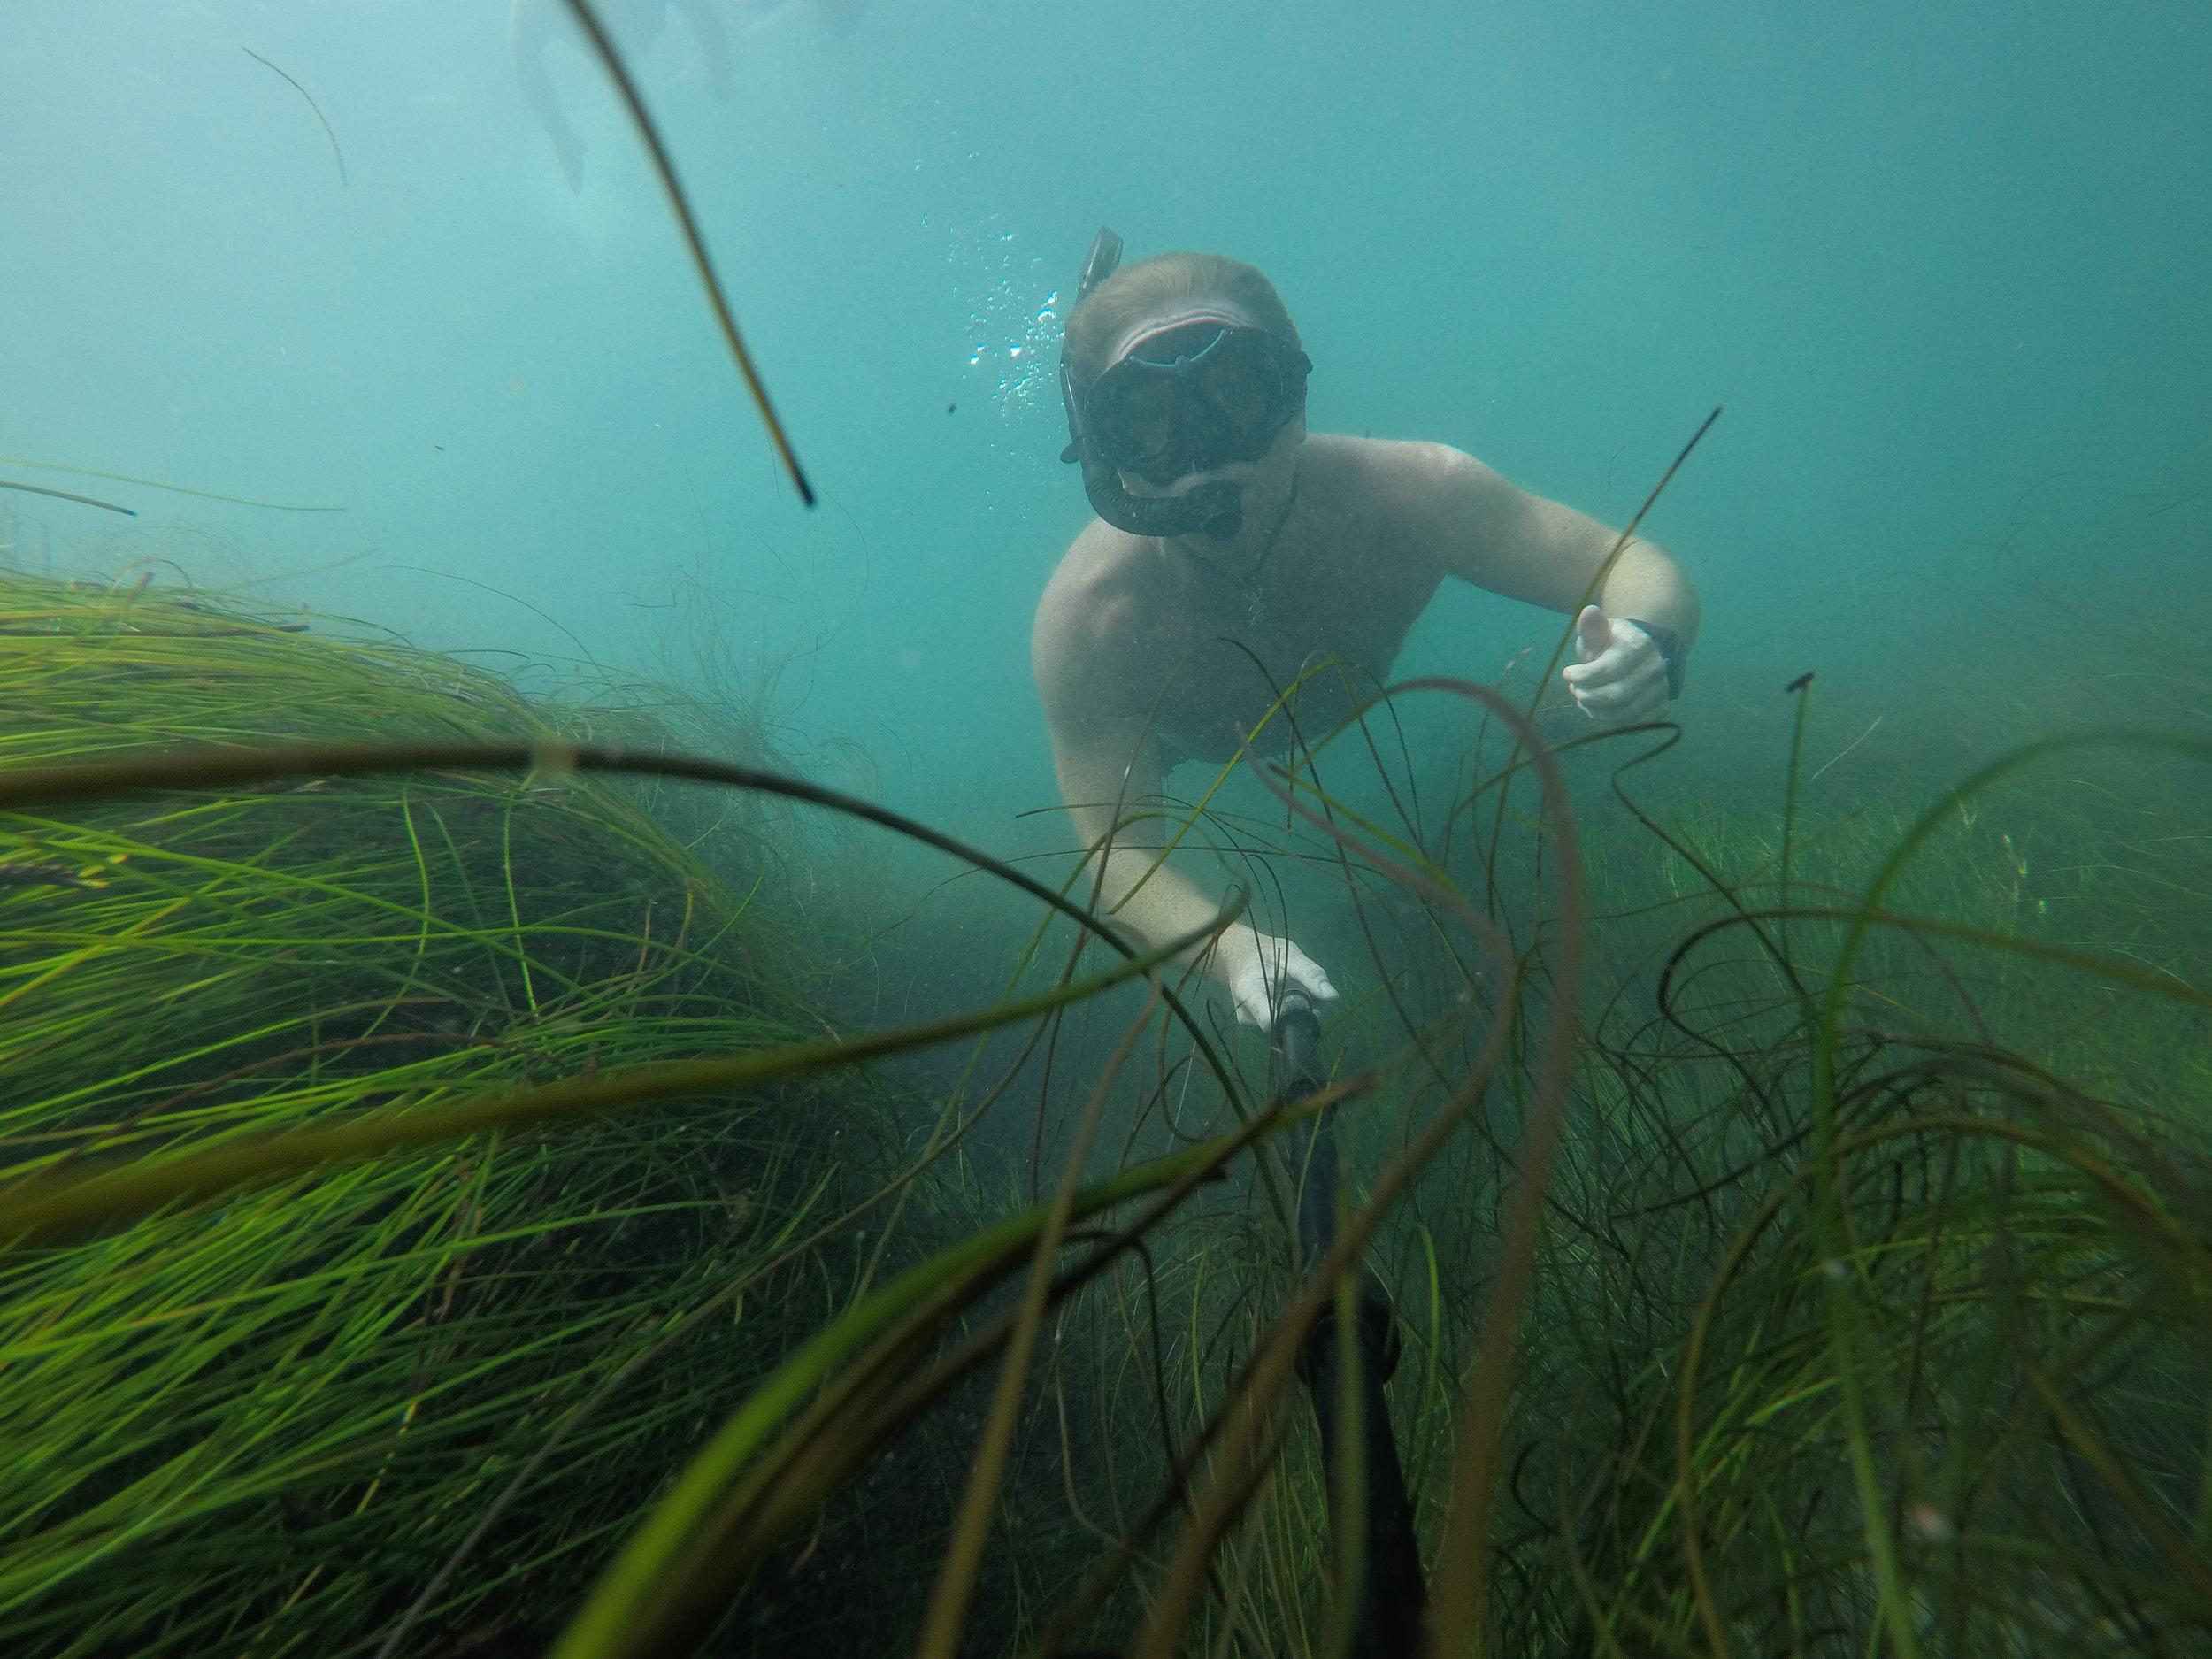 Dive water diving outdoors excursion SEA laguna beach CA Ella Lea Eric Belisa Chad Seal PUPs G0080766.JPG